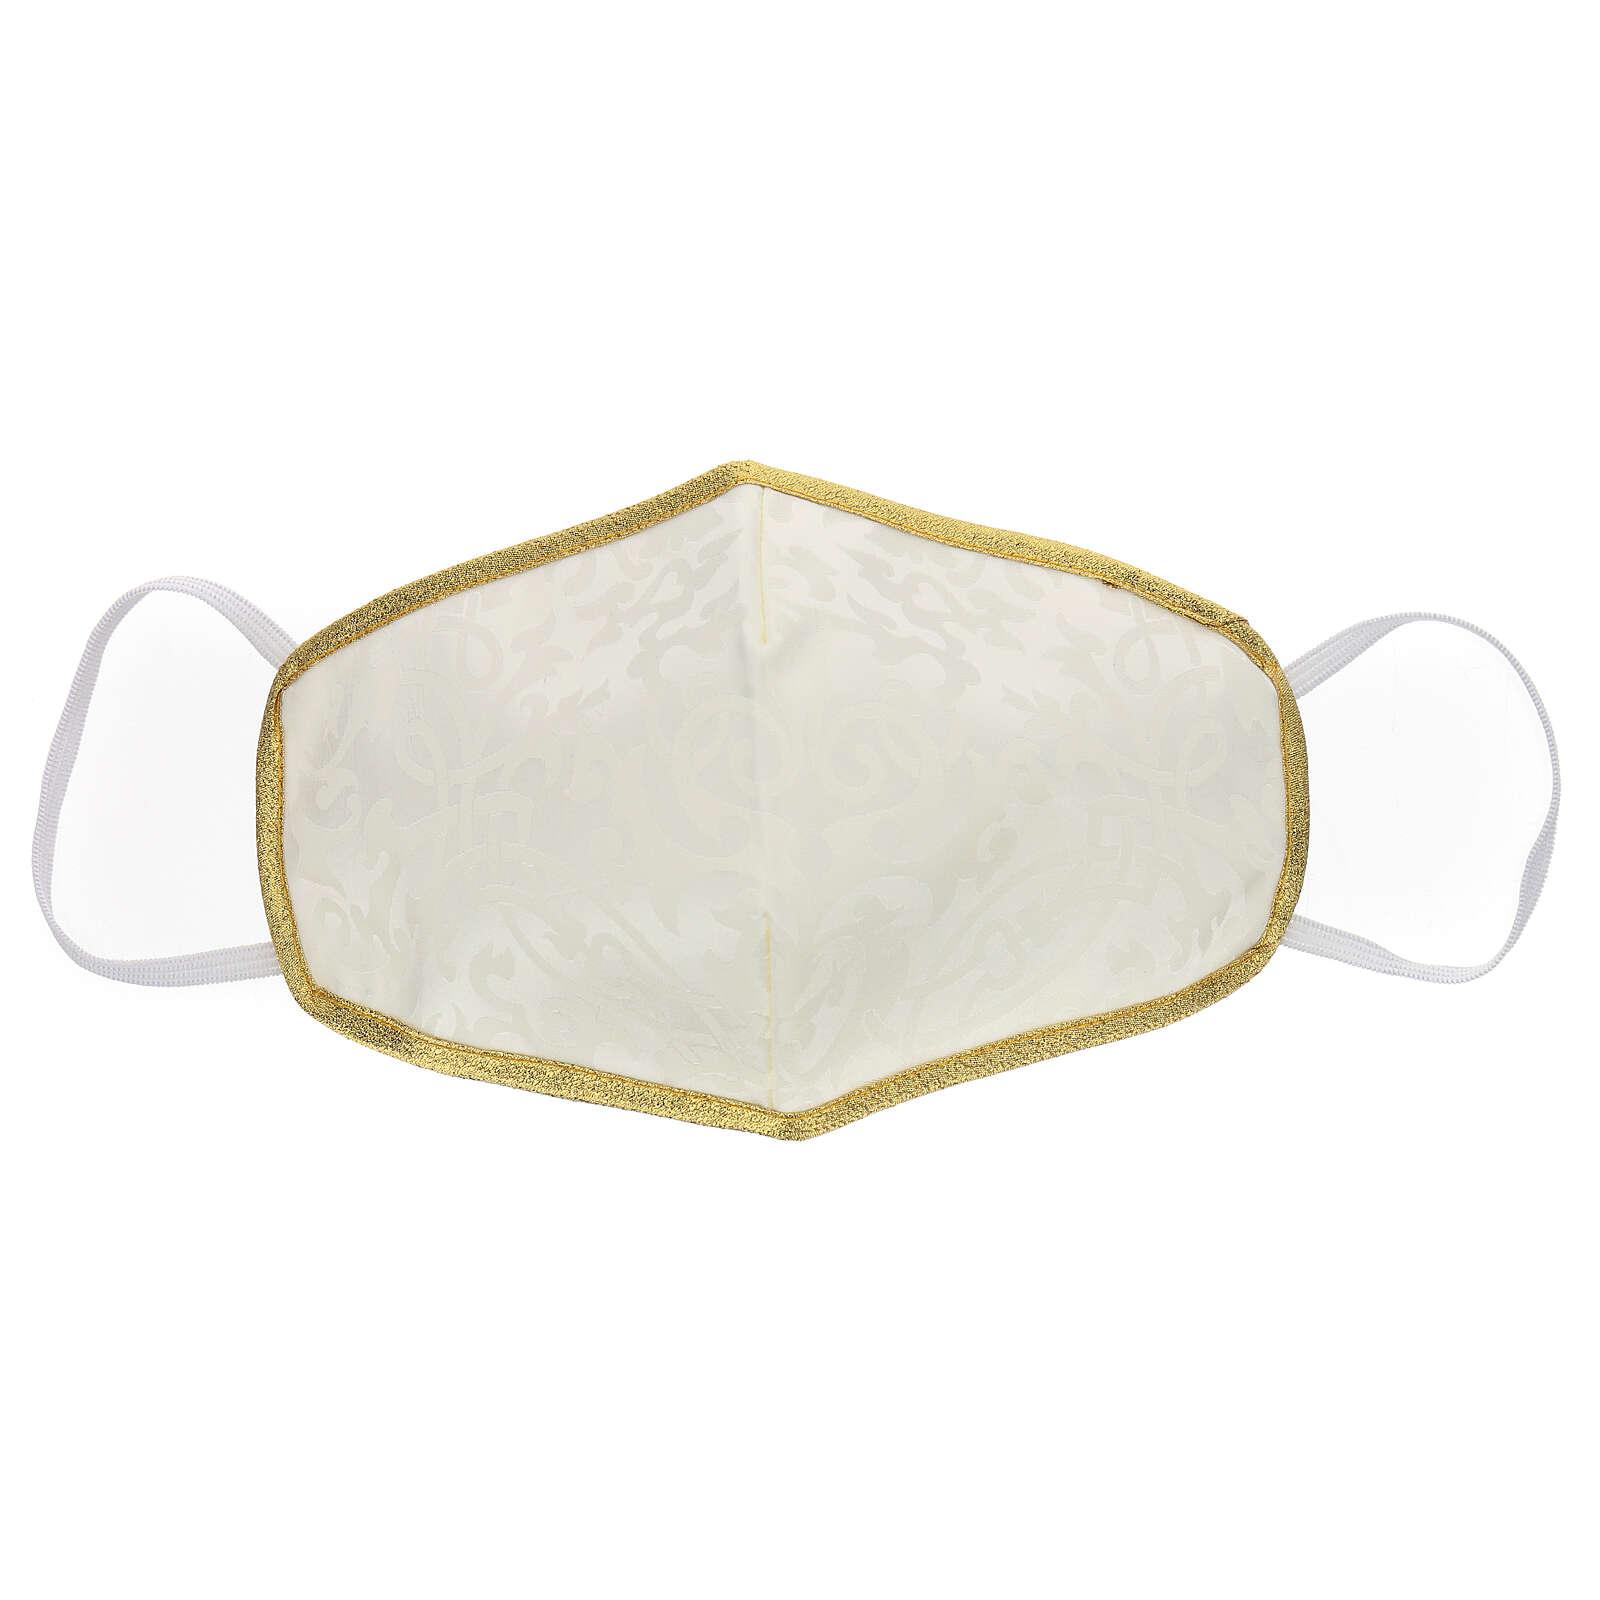 Mascherina in tessuto lavabile avorio/oro 3